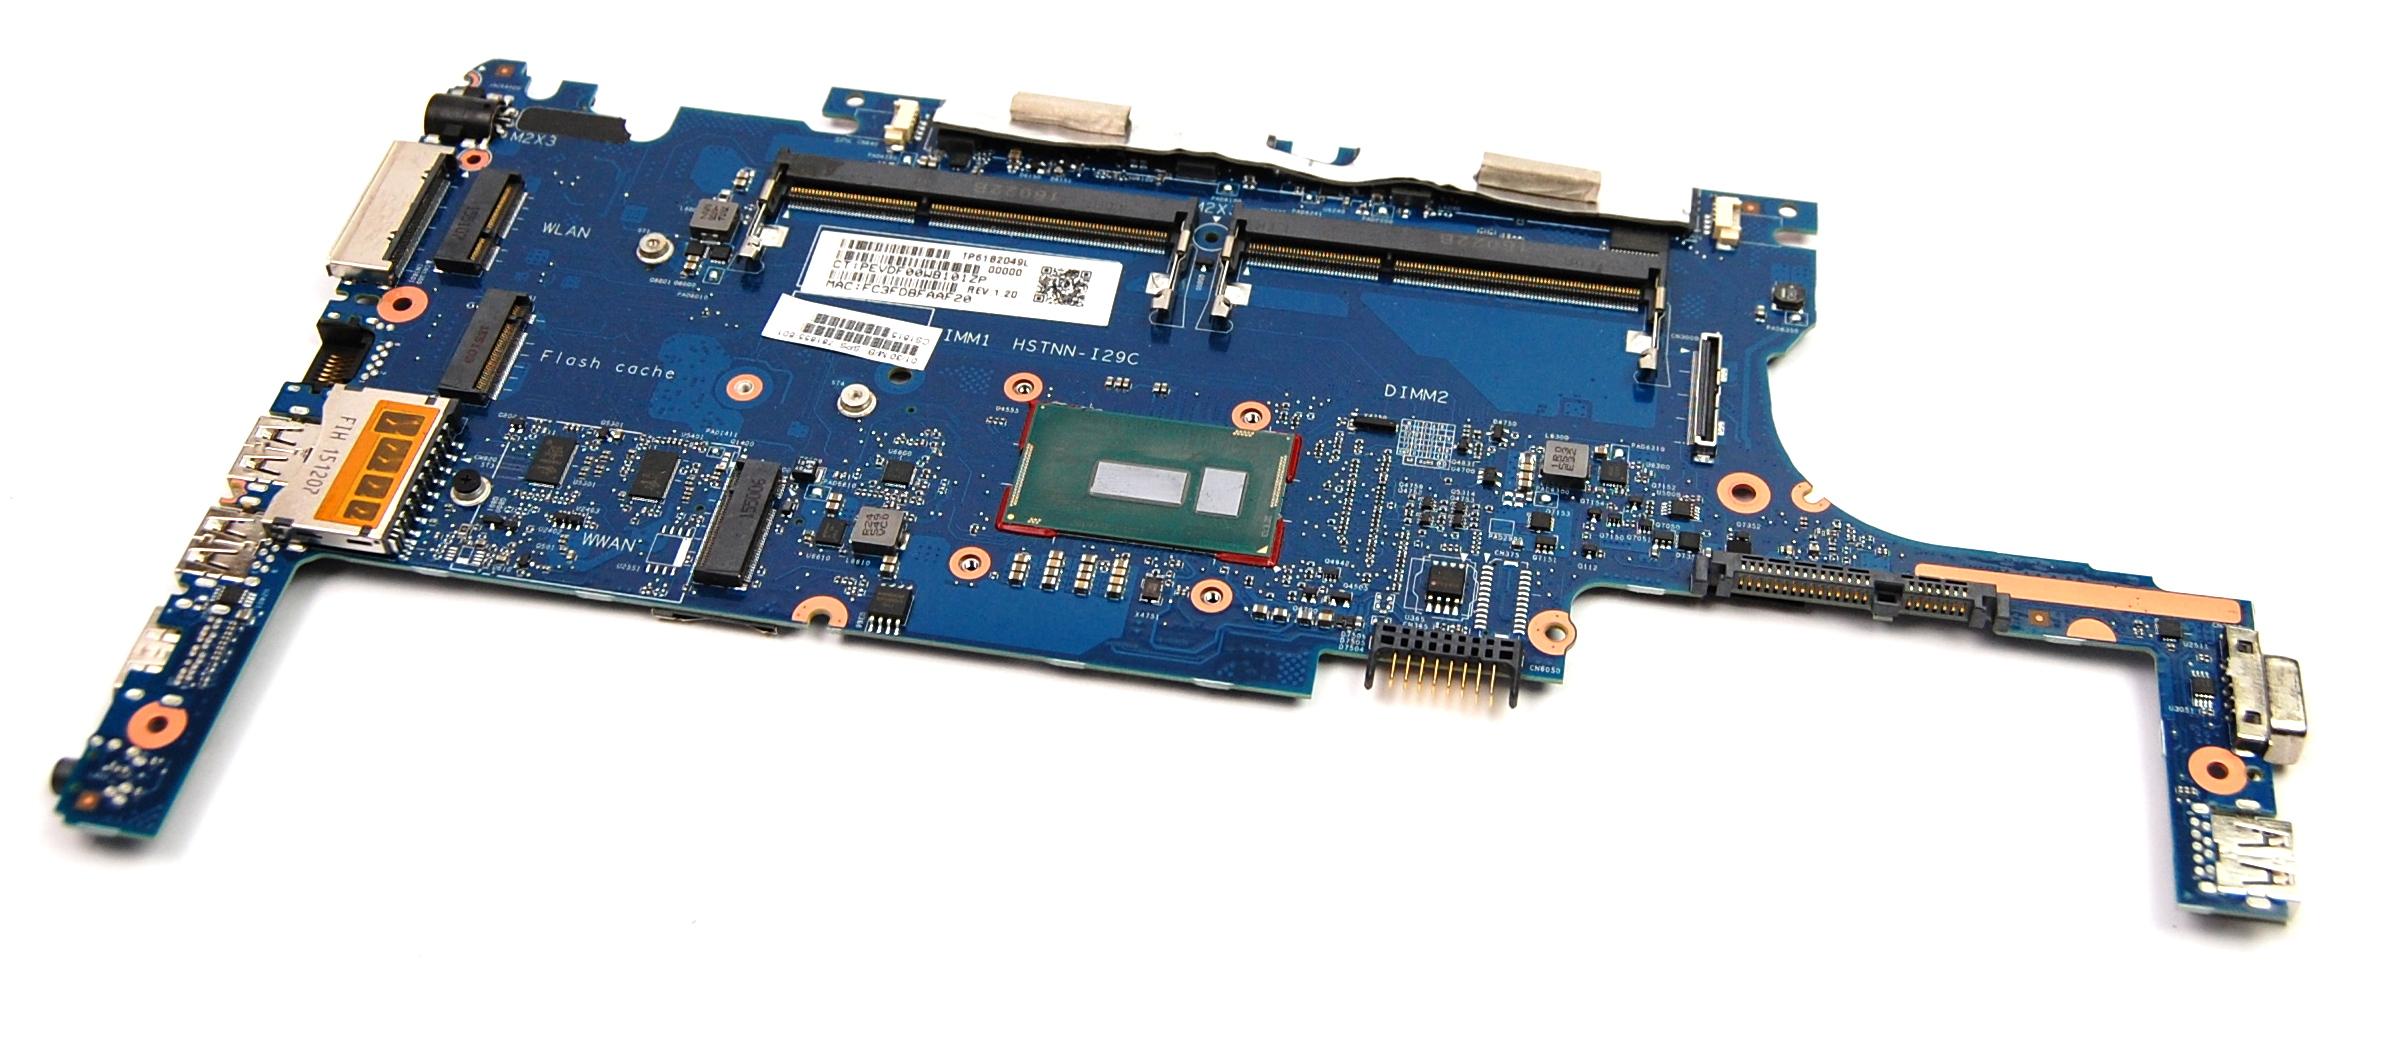 HP 781855-601 EliteBook 820 G2 Motherboard with Intel i5-5200U CPU